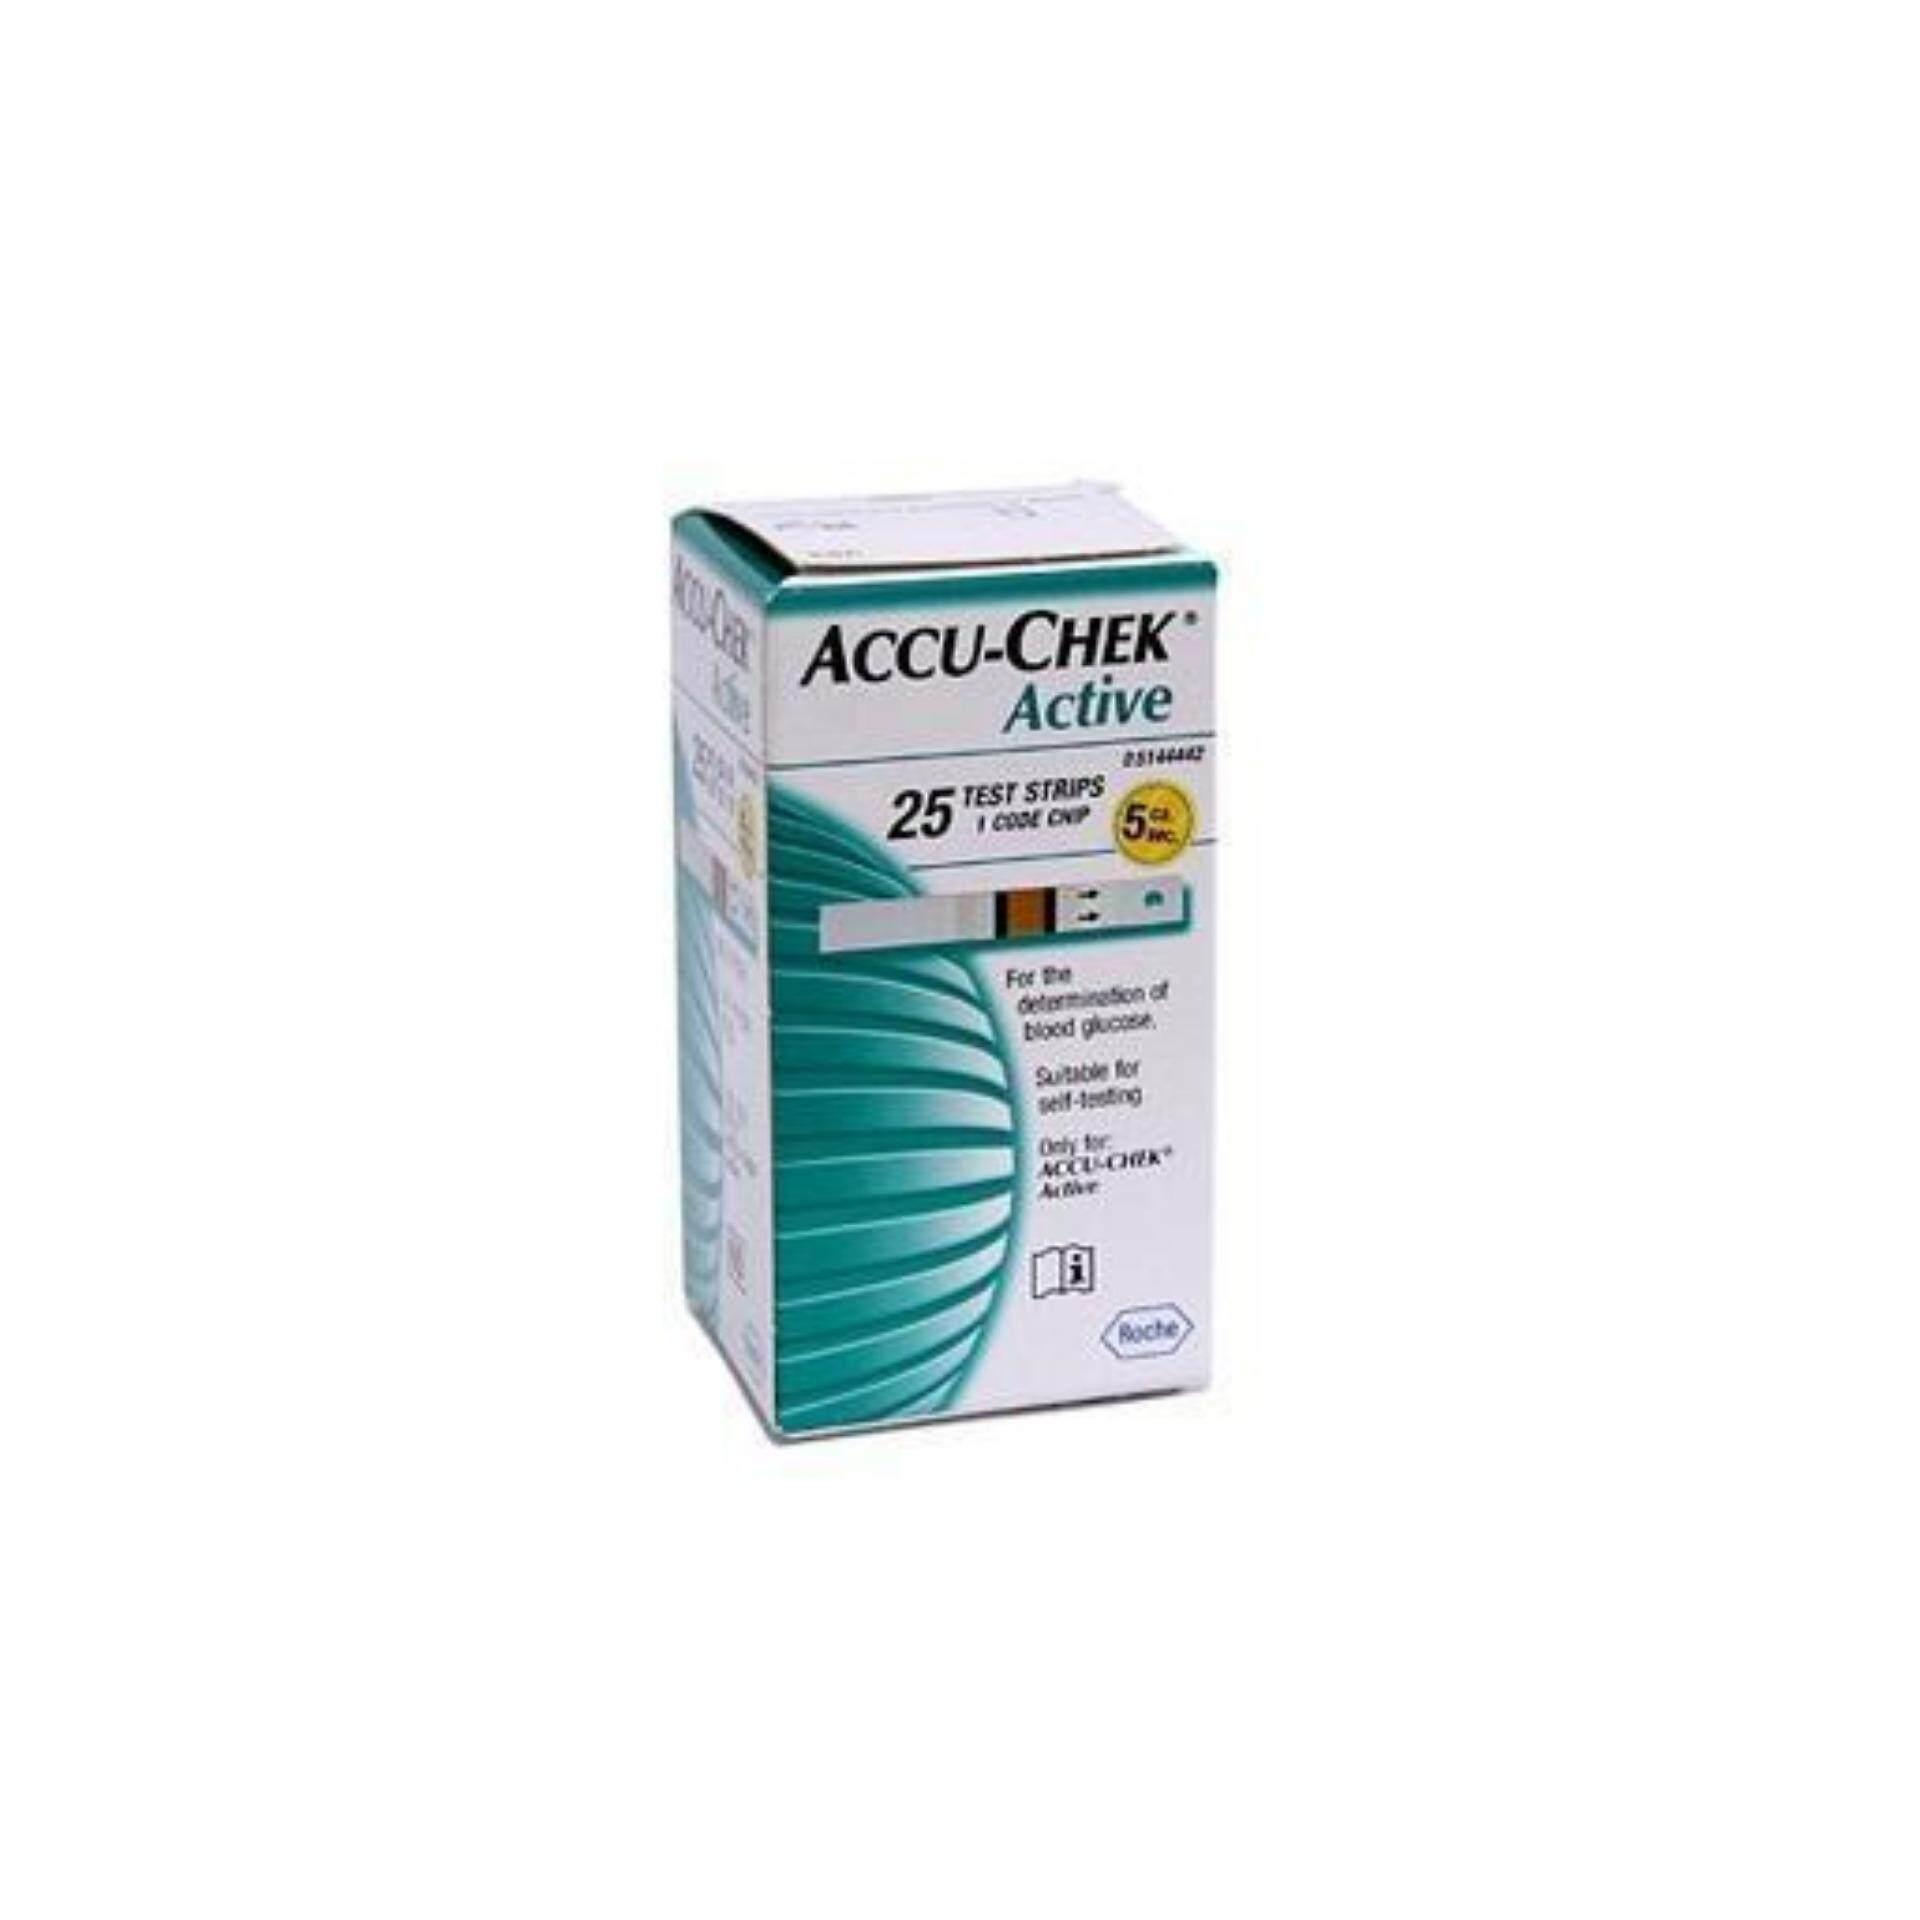 Accu-Chek Active Test Strips 25pcs X 2